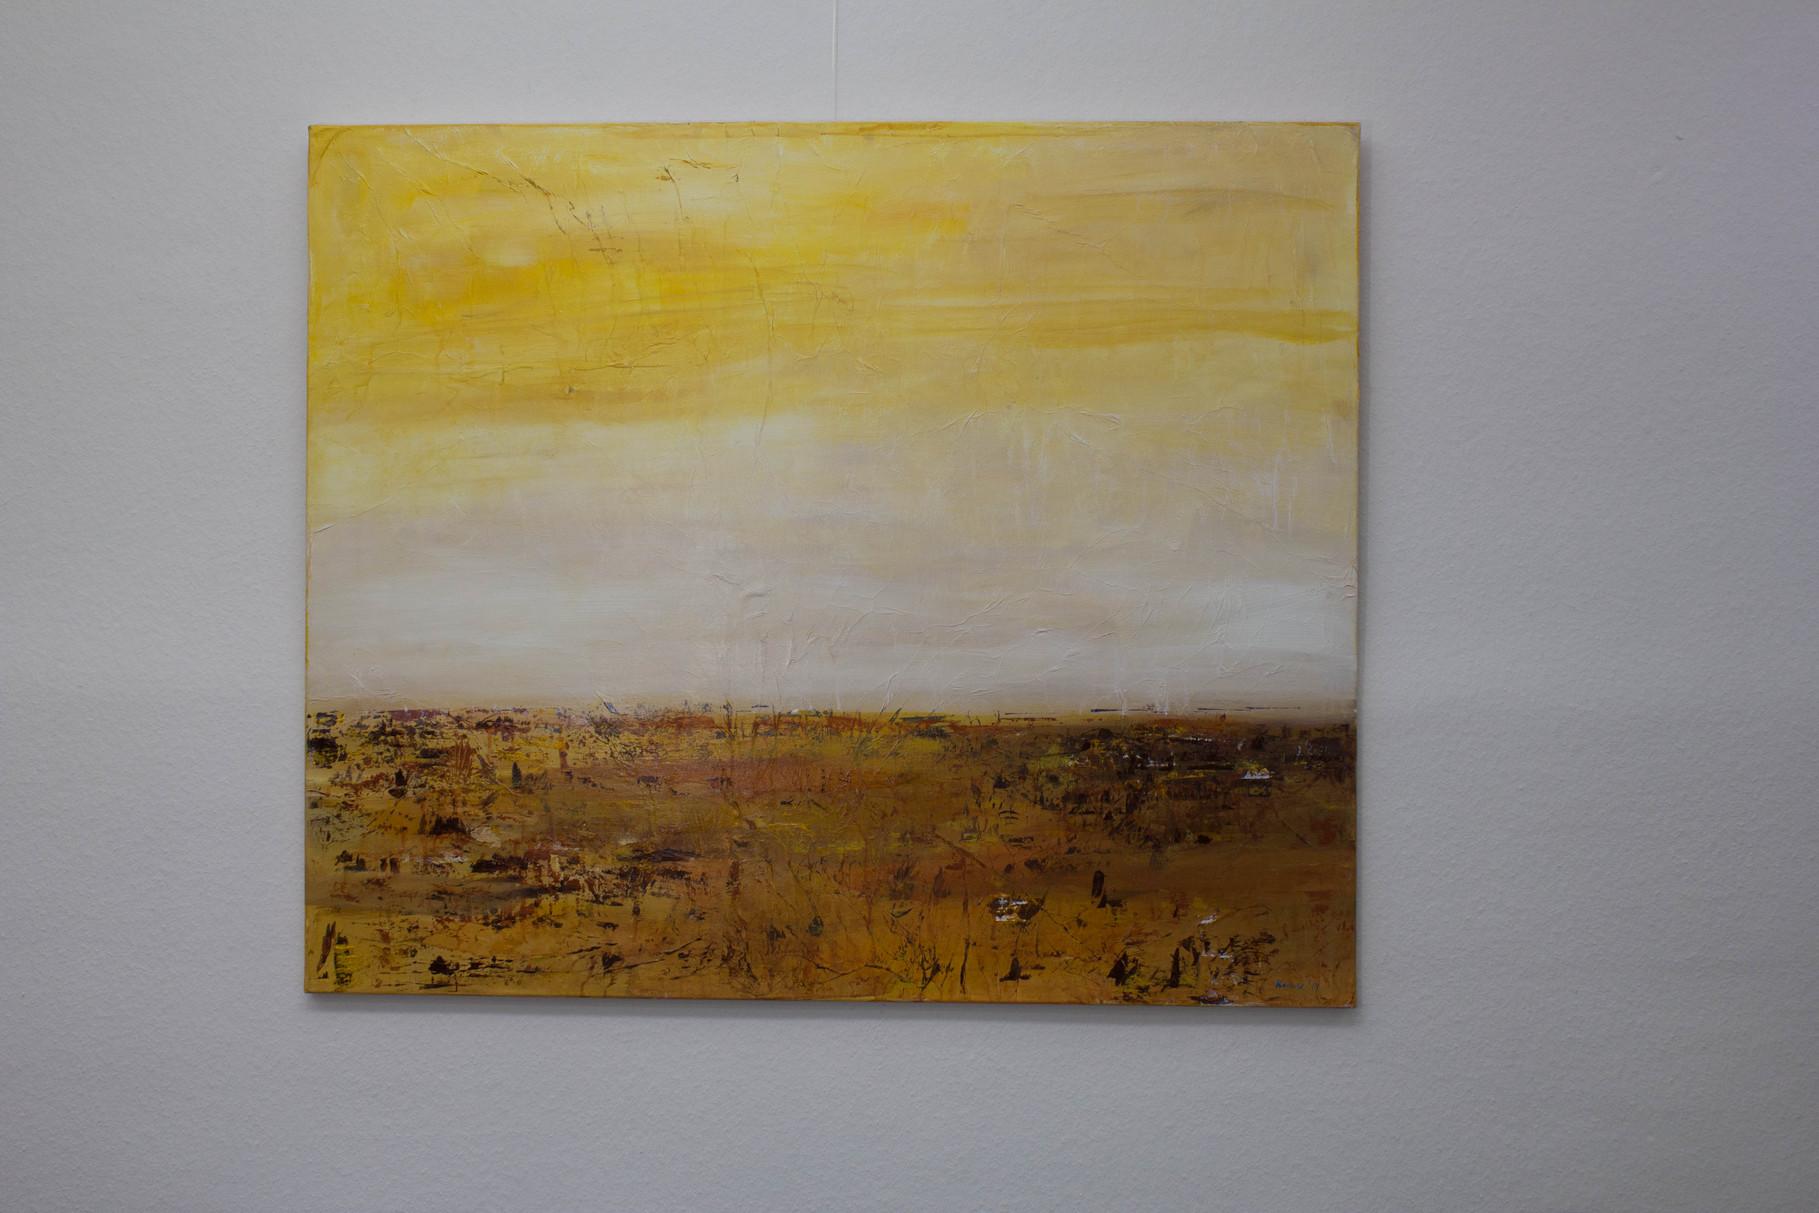 Nr. 3 Dietmar Krause, Acryl auf Leinwand, 100 x 120cm